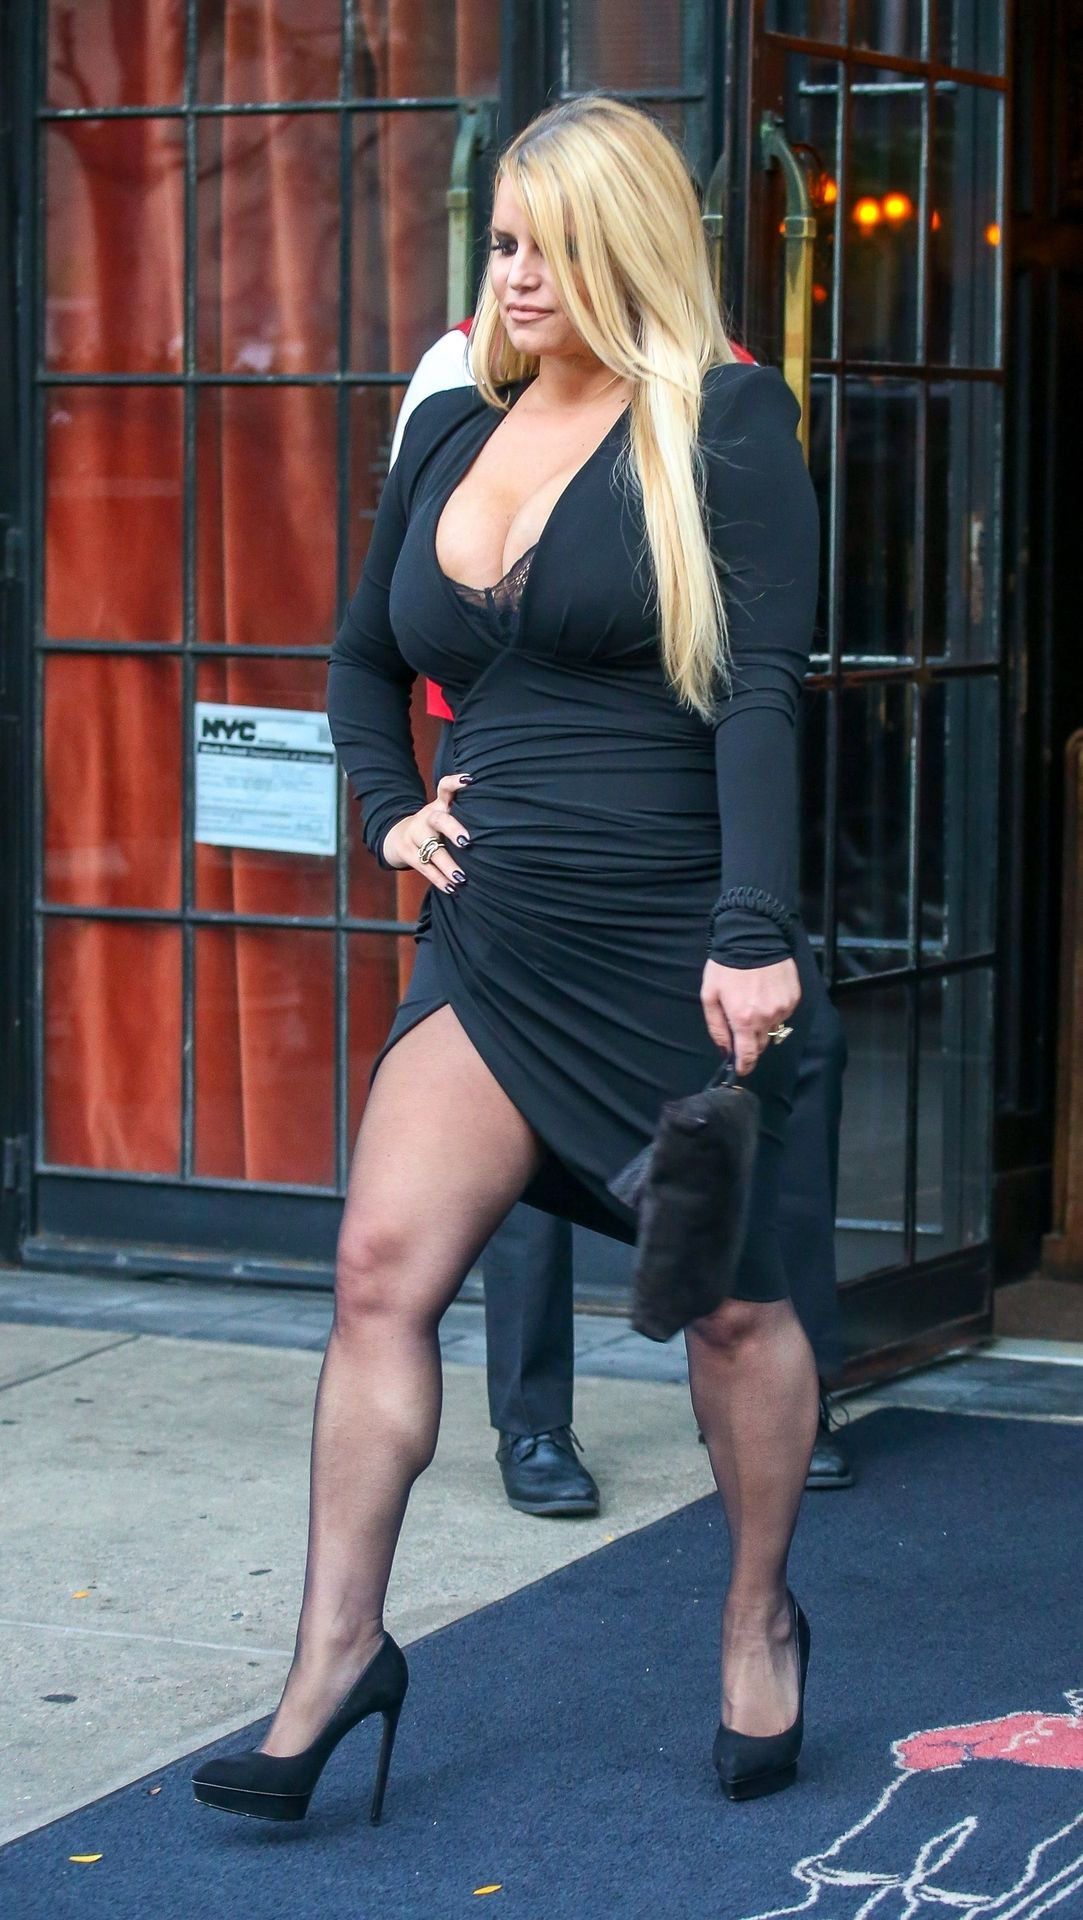 Jessica Simpson Big Cleavage | Hot Celebs Home